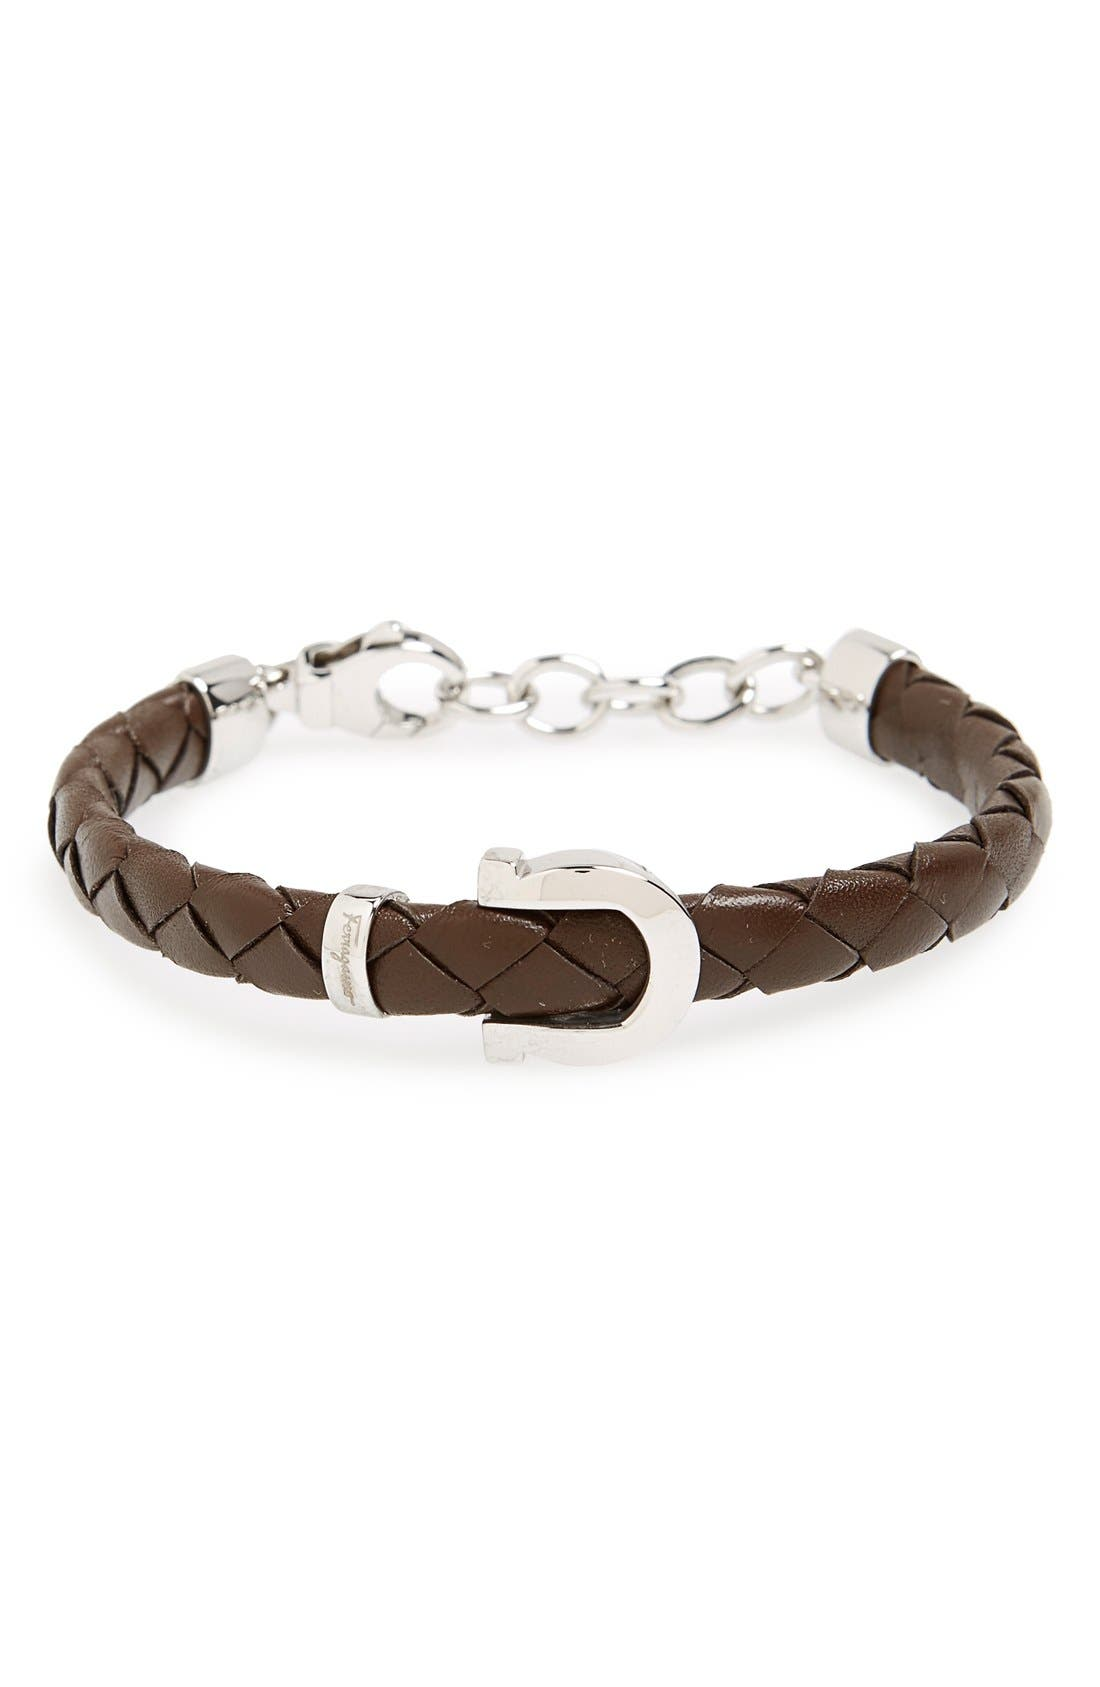 Alternate Image 1 Selected - Salvatore Ferragamo Gancio Braided Leather Bracelet